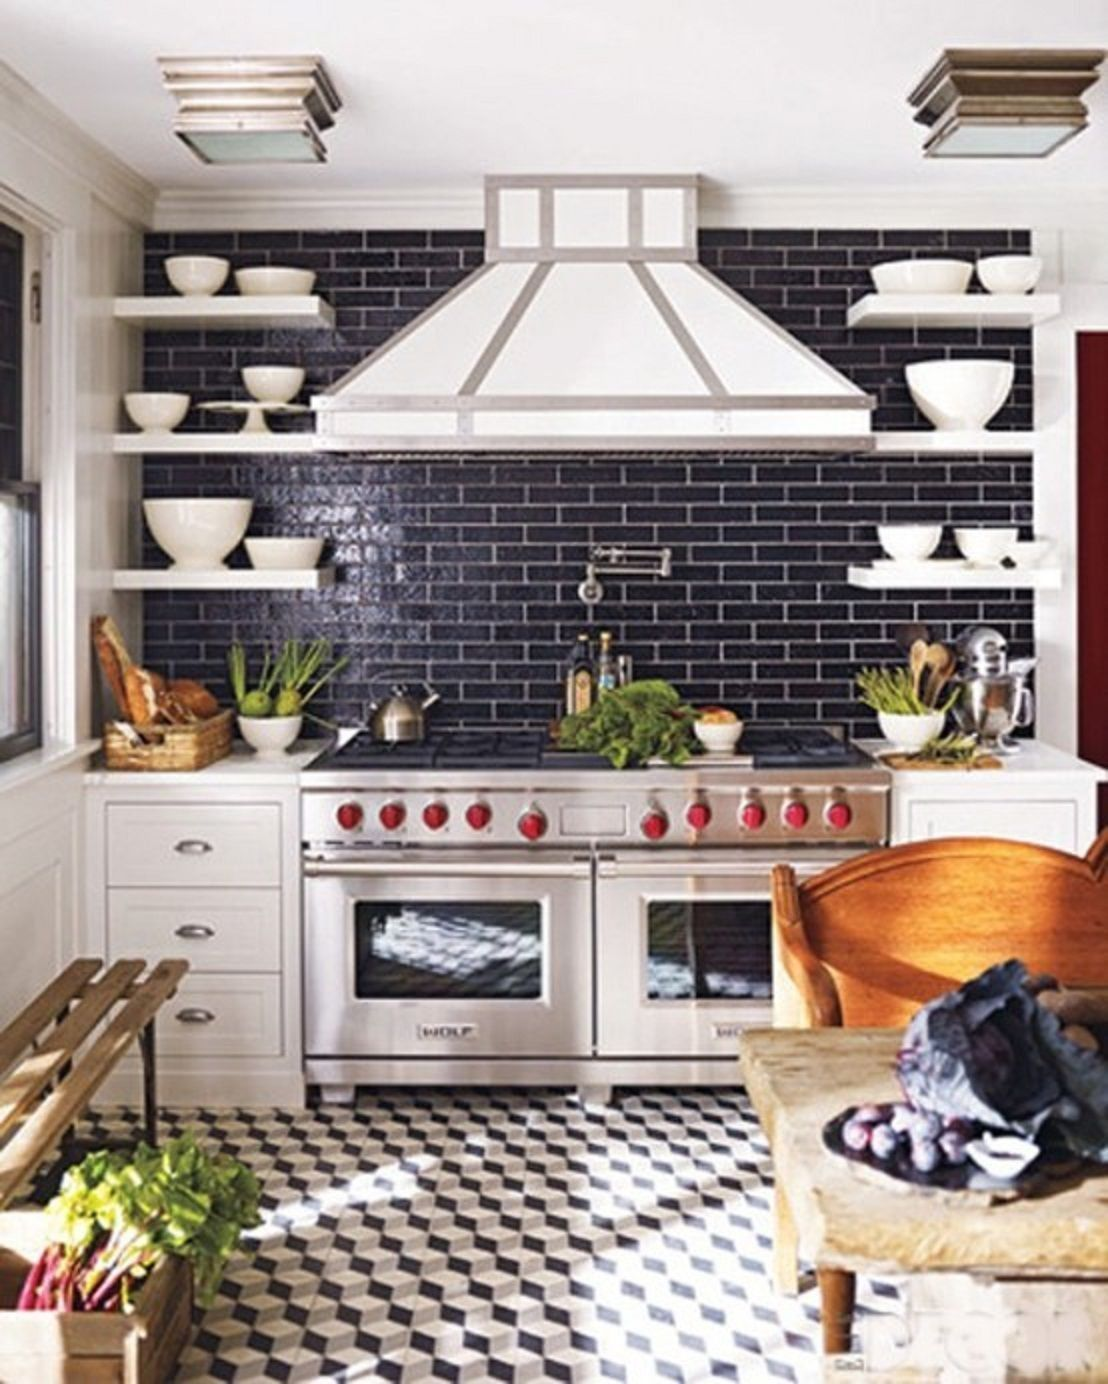 Clean And Classic Subway Tile Kitchen Backsplash Kitchen Inspirations Kitchen Remodel Home Kitchens